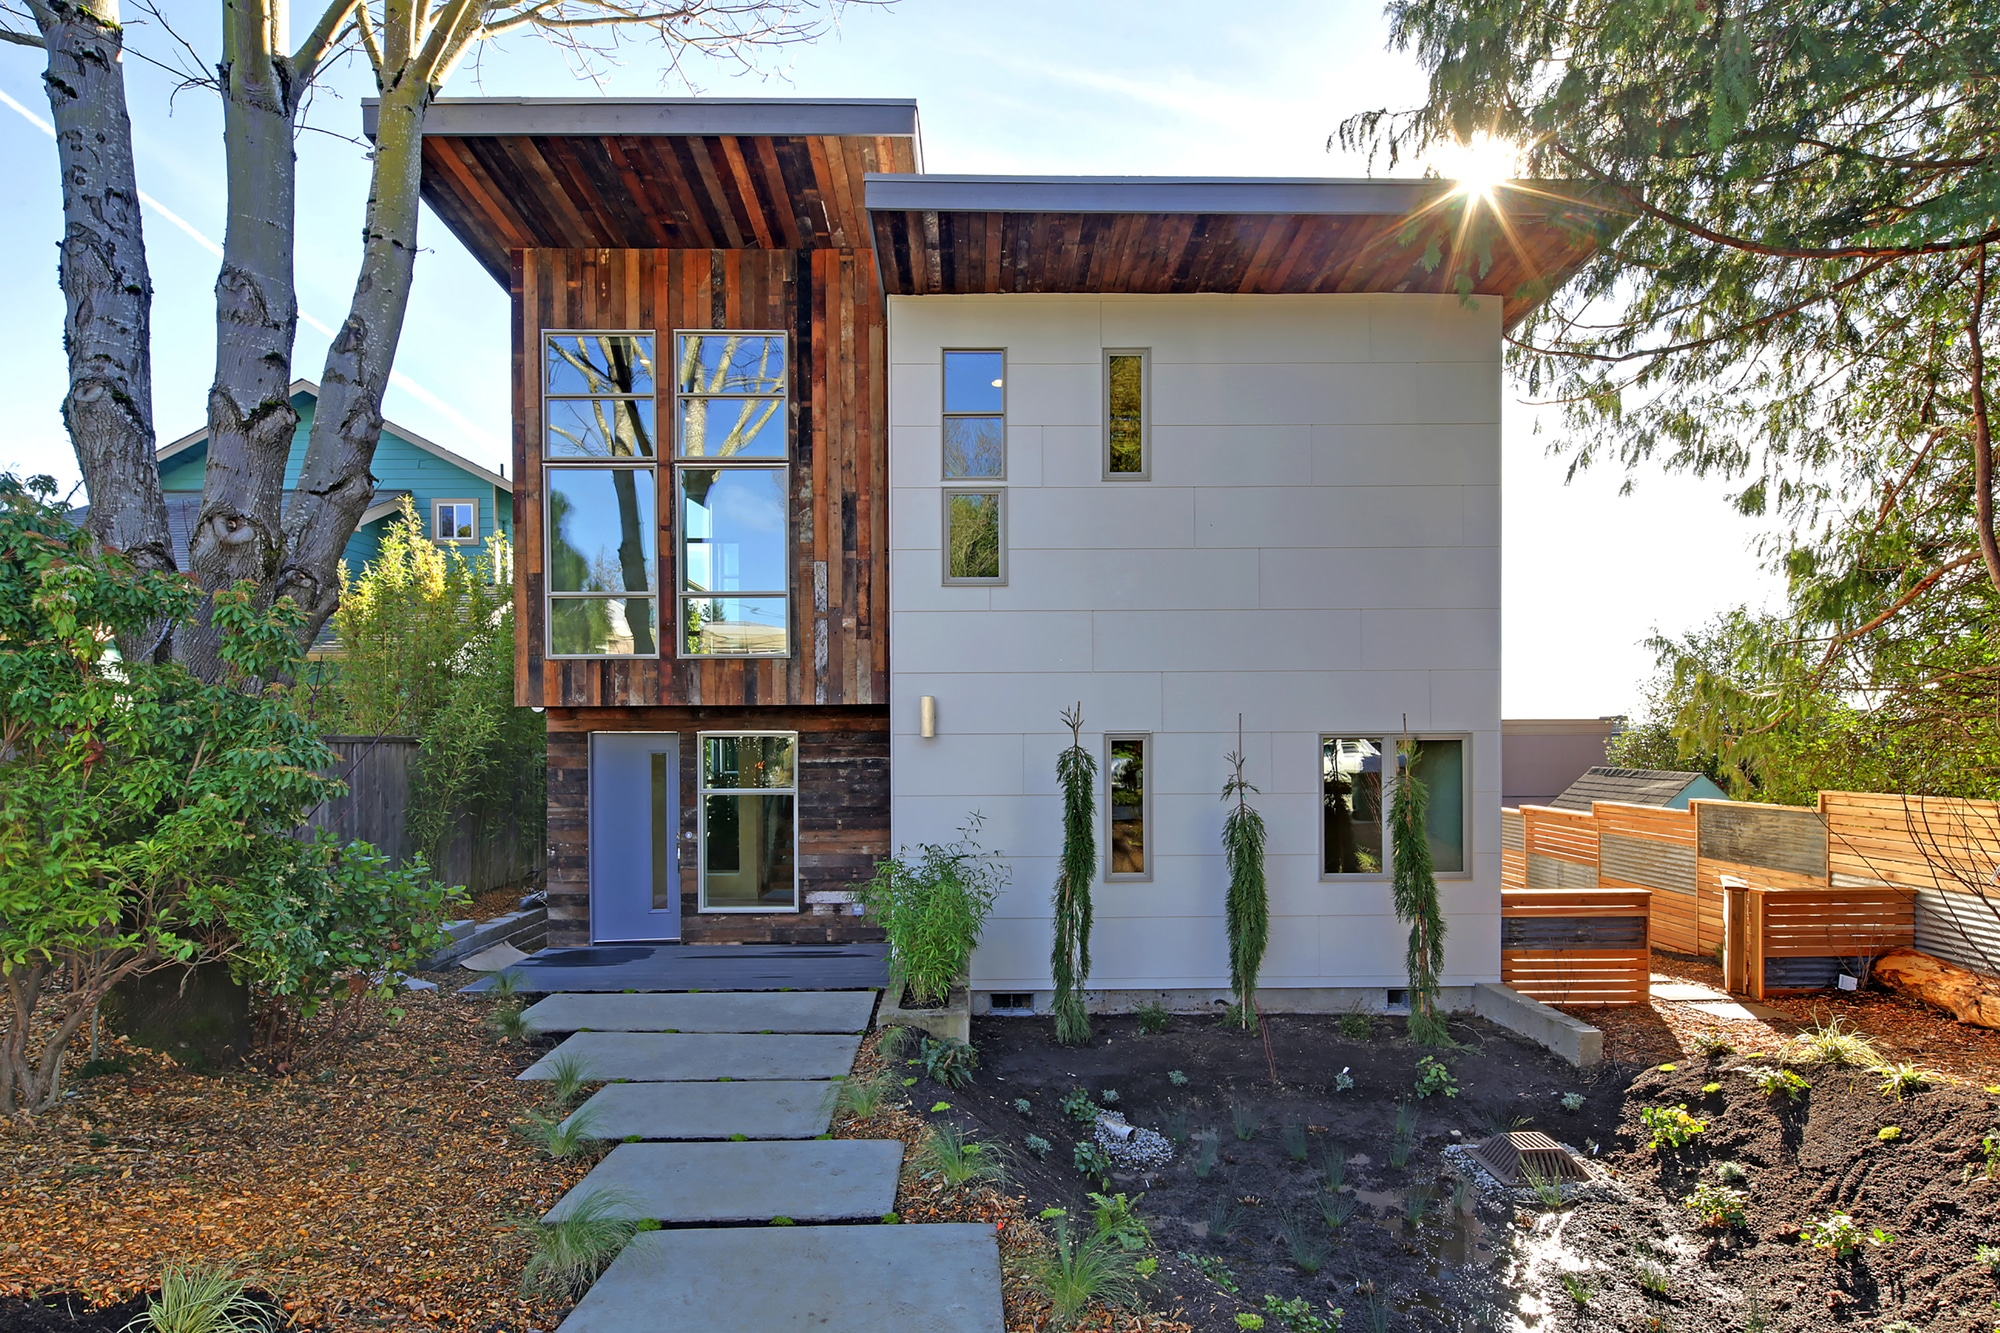 Dise o casa ecol gica autosuficiente planos construye hogar - Construye hogar ...